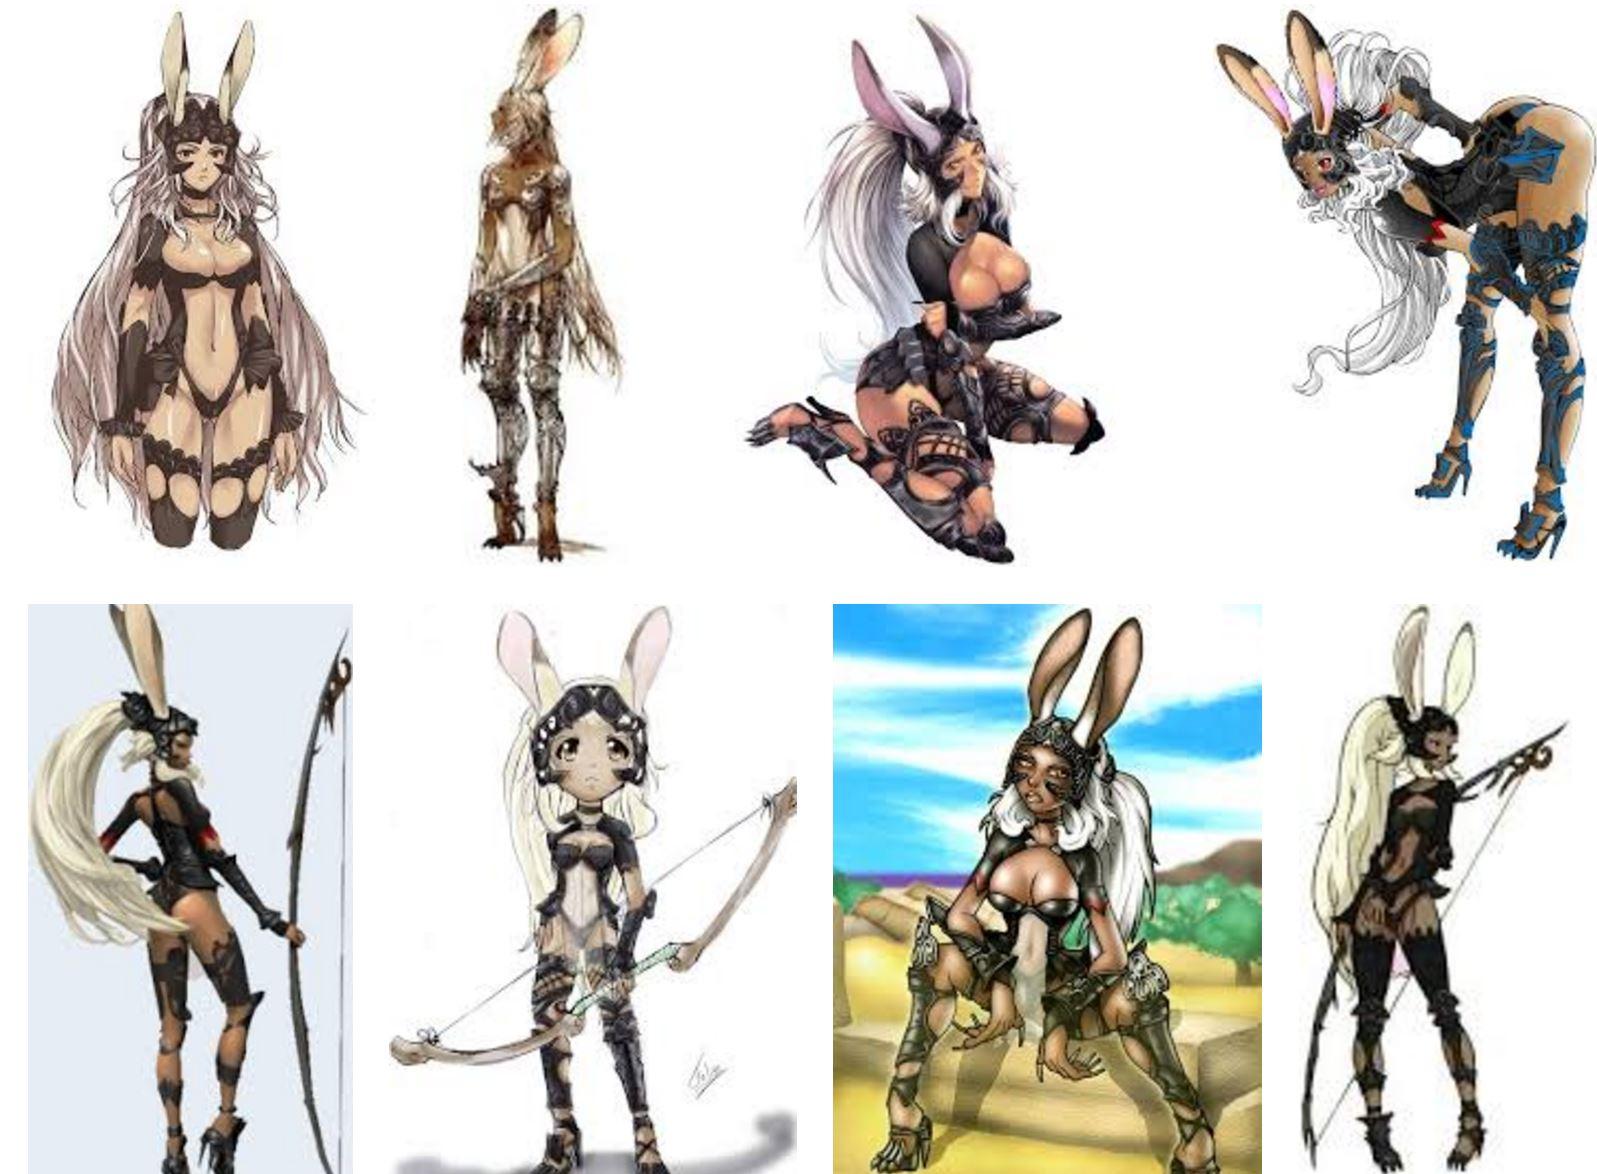 Square-Enix Wants Final Fantasy XIV on Nintendo Switch